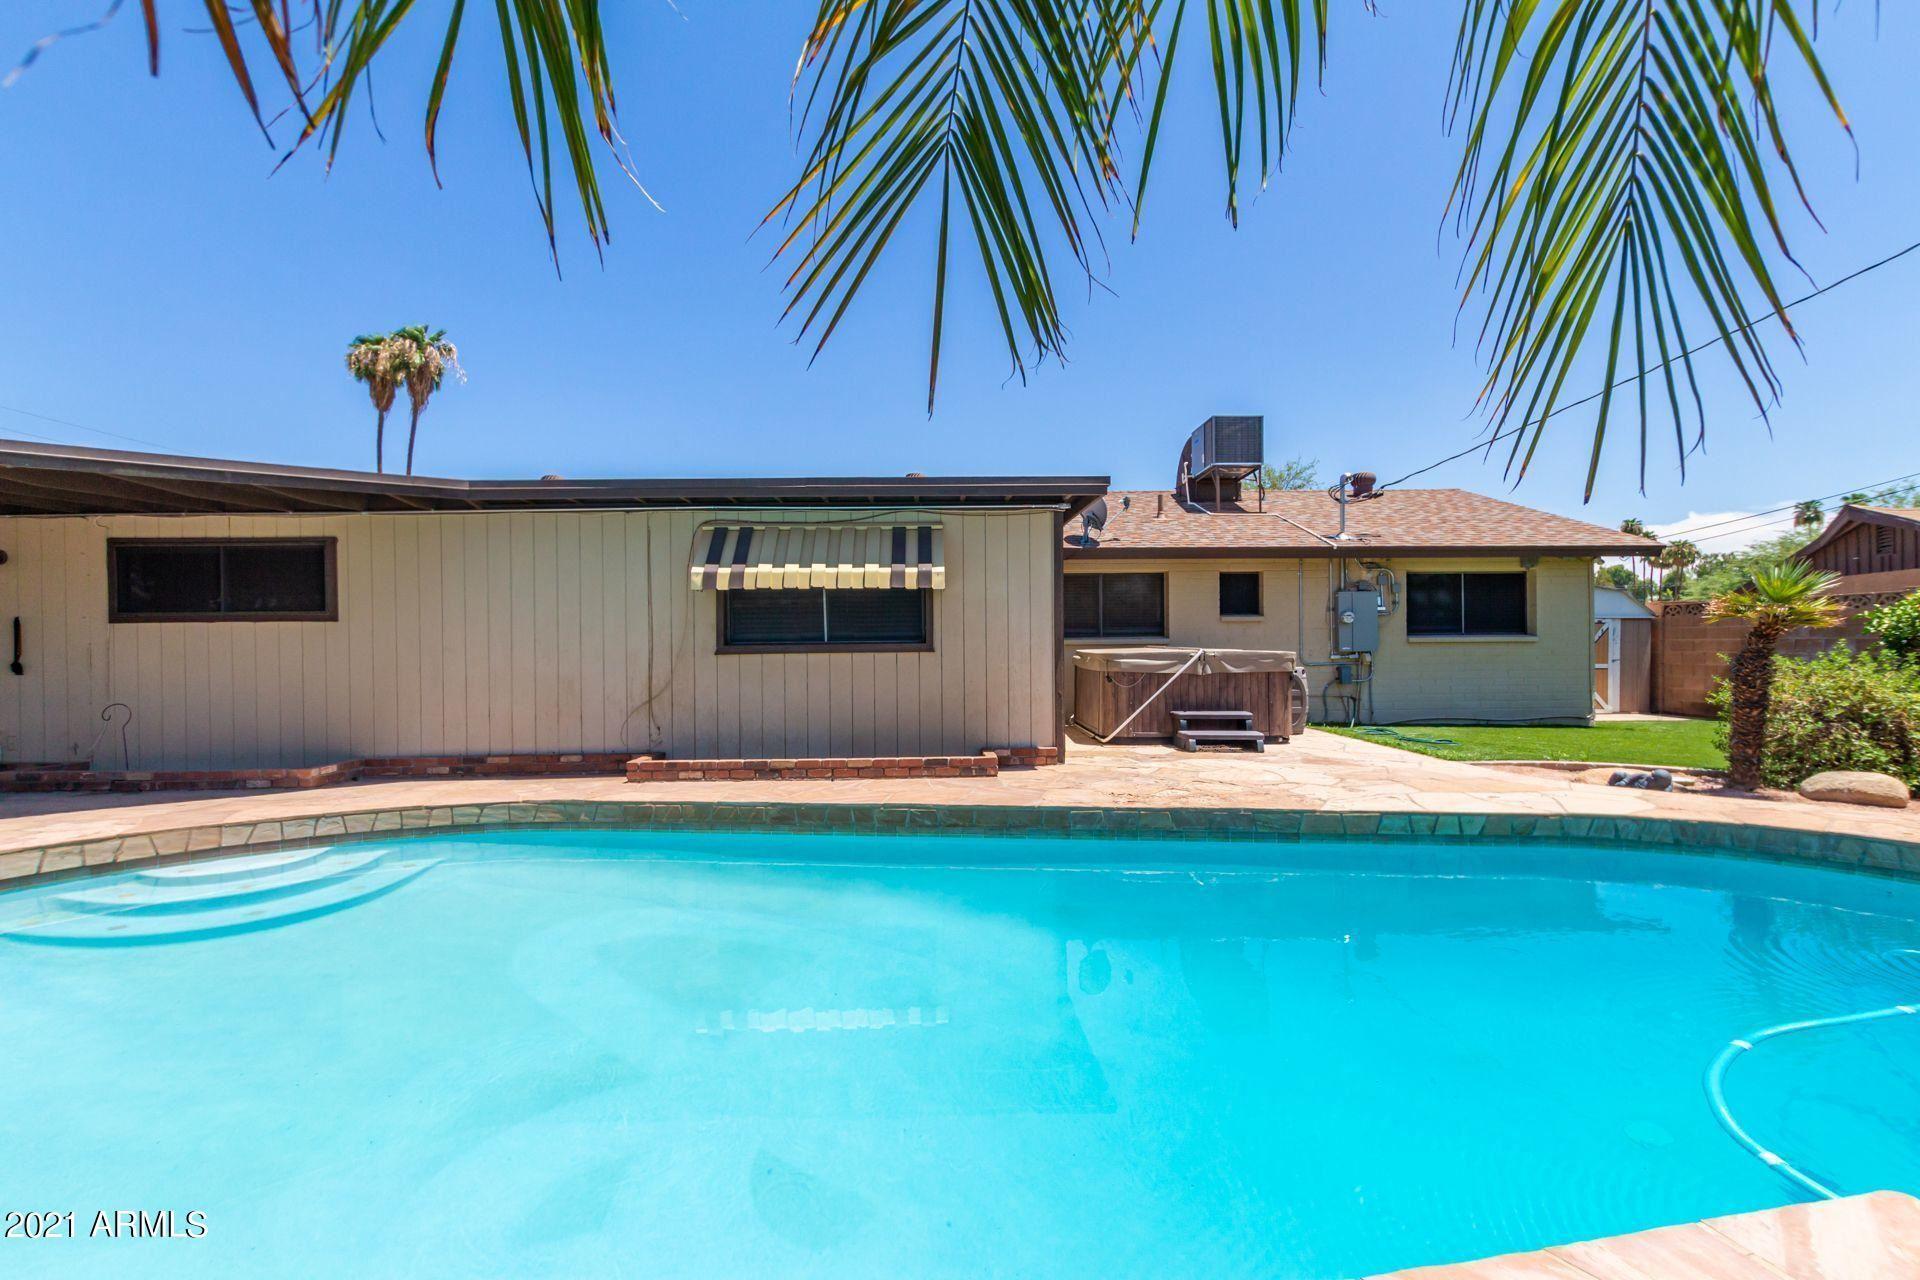 850 W HEATHER Drive, Mesa, AZ 85201 - MLS#: 6271618